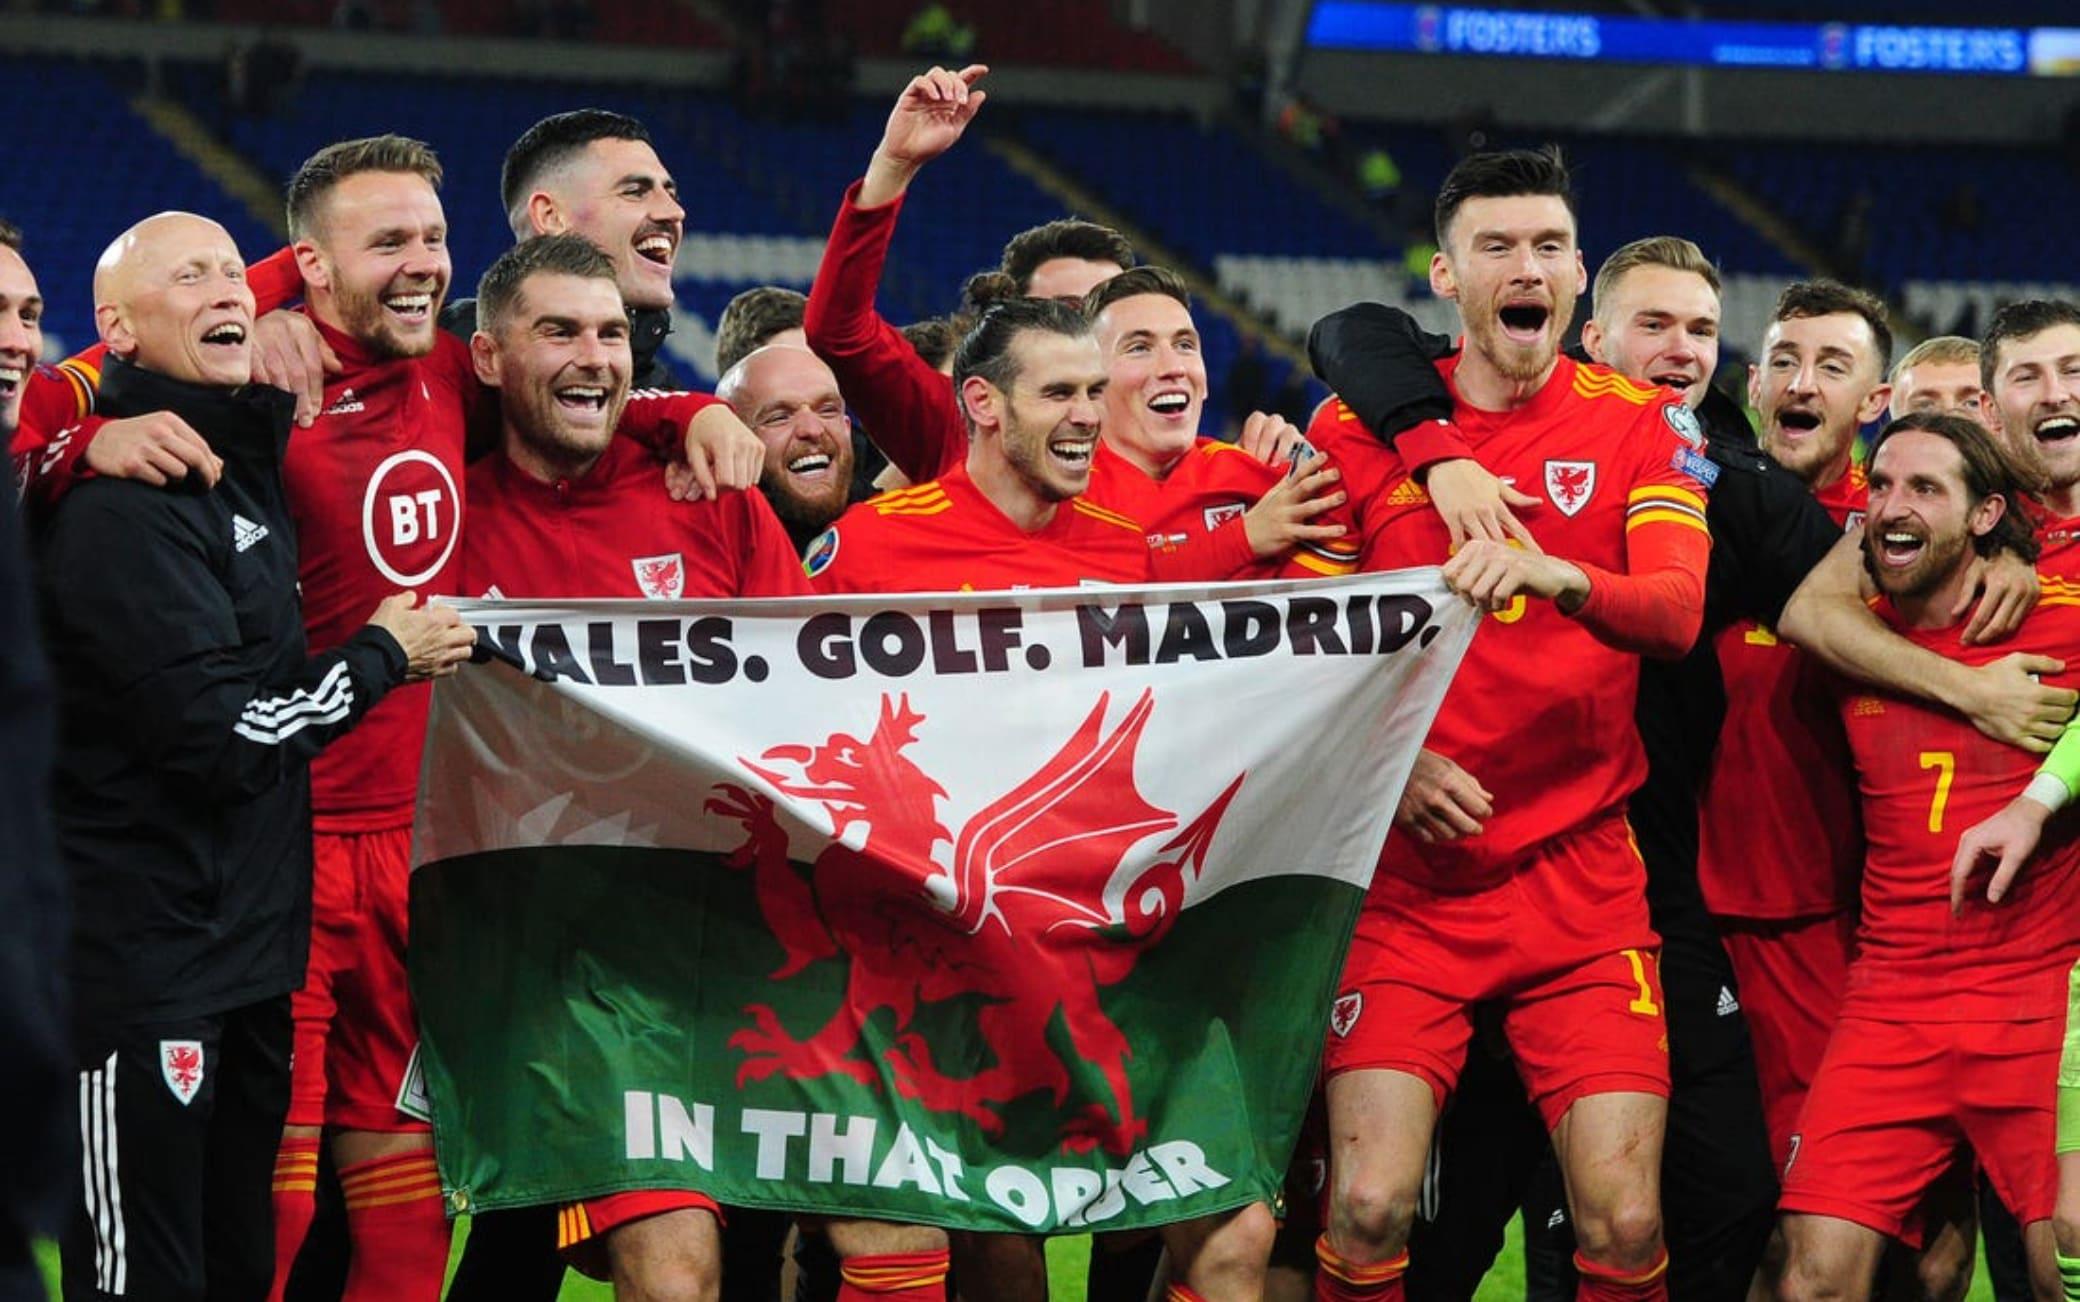 La bandiera di Bale